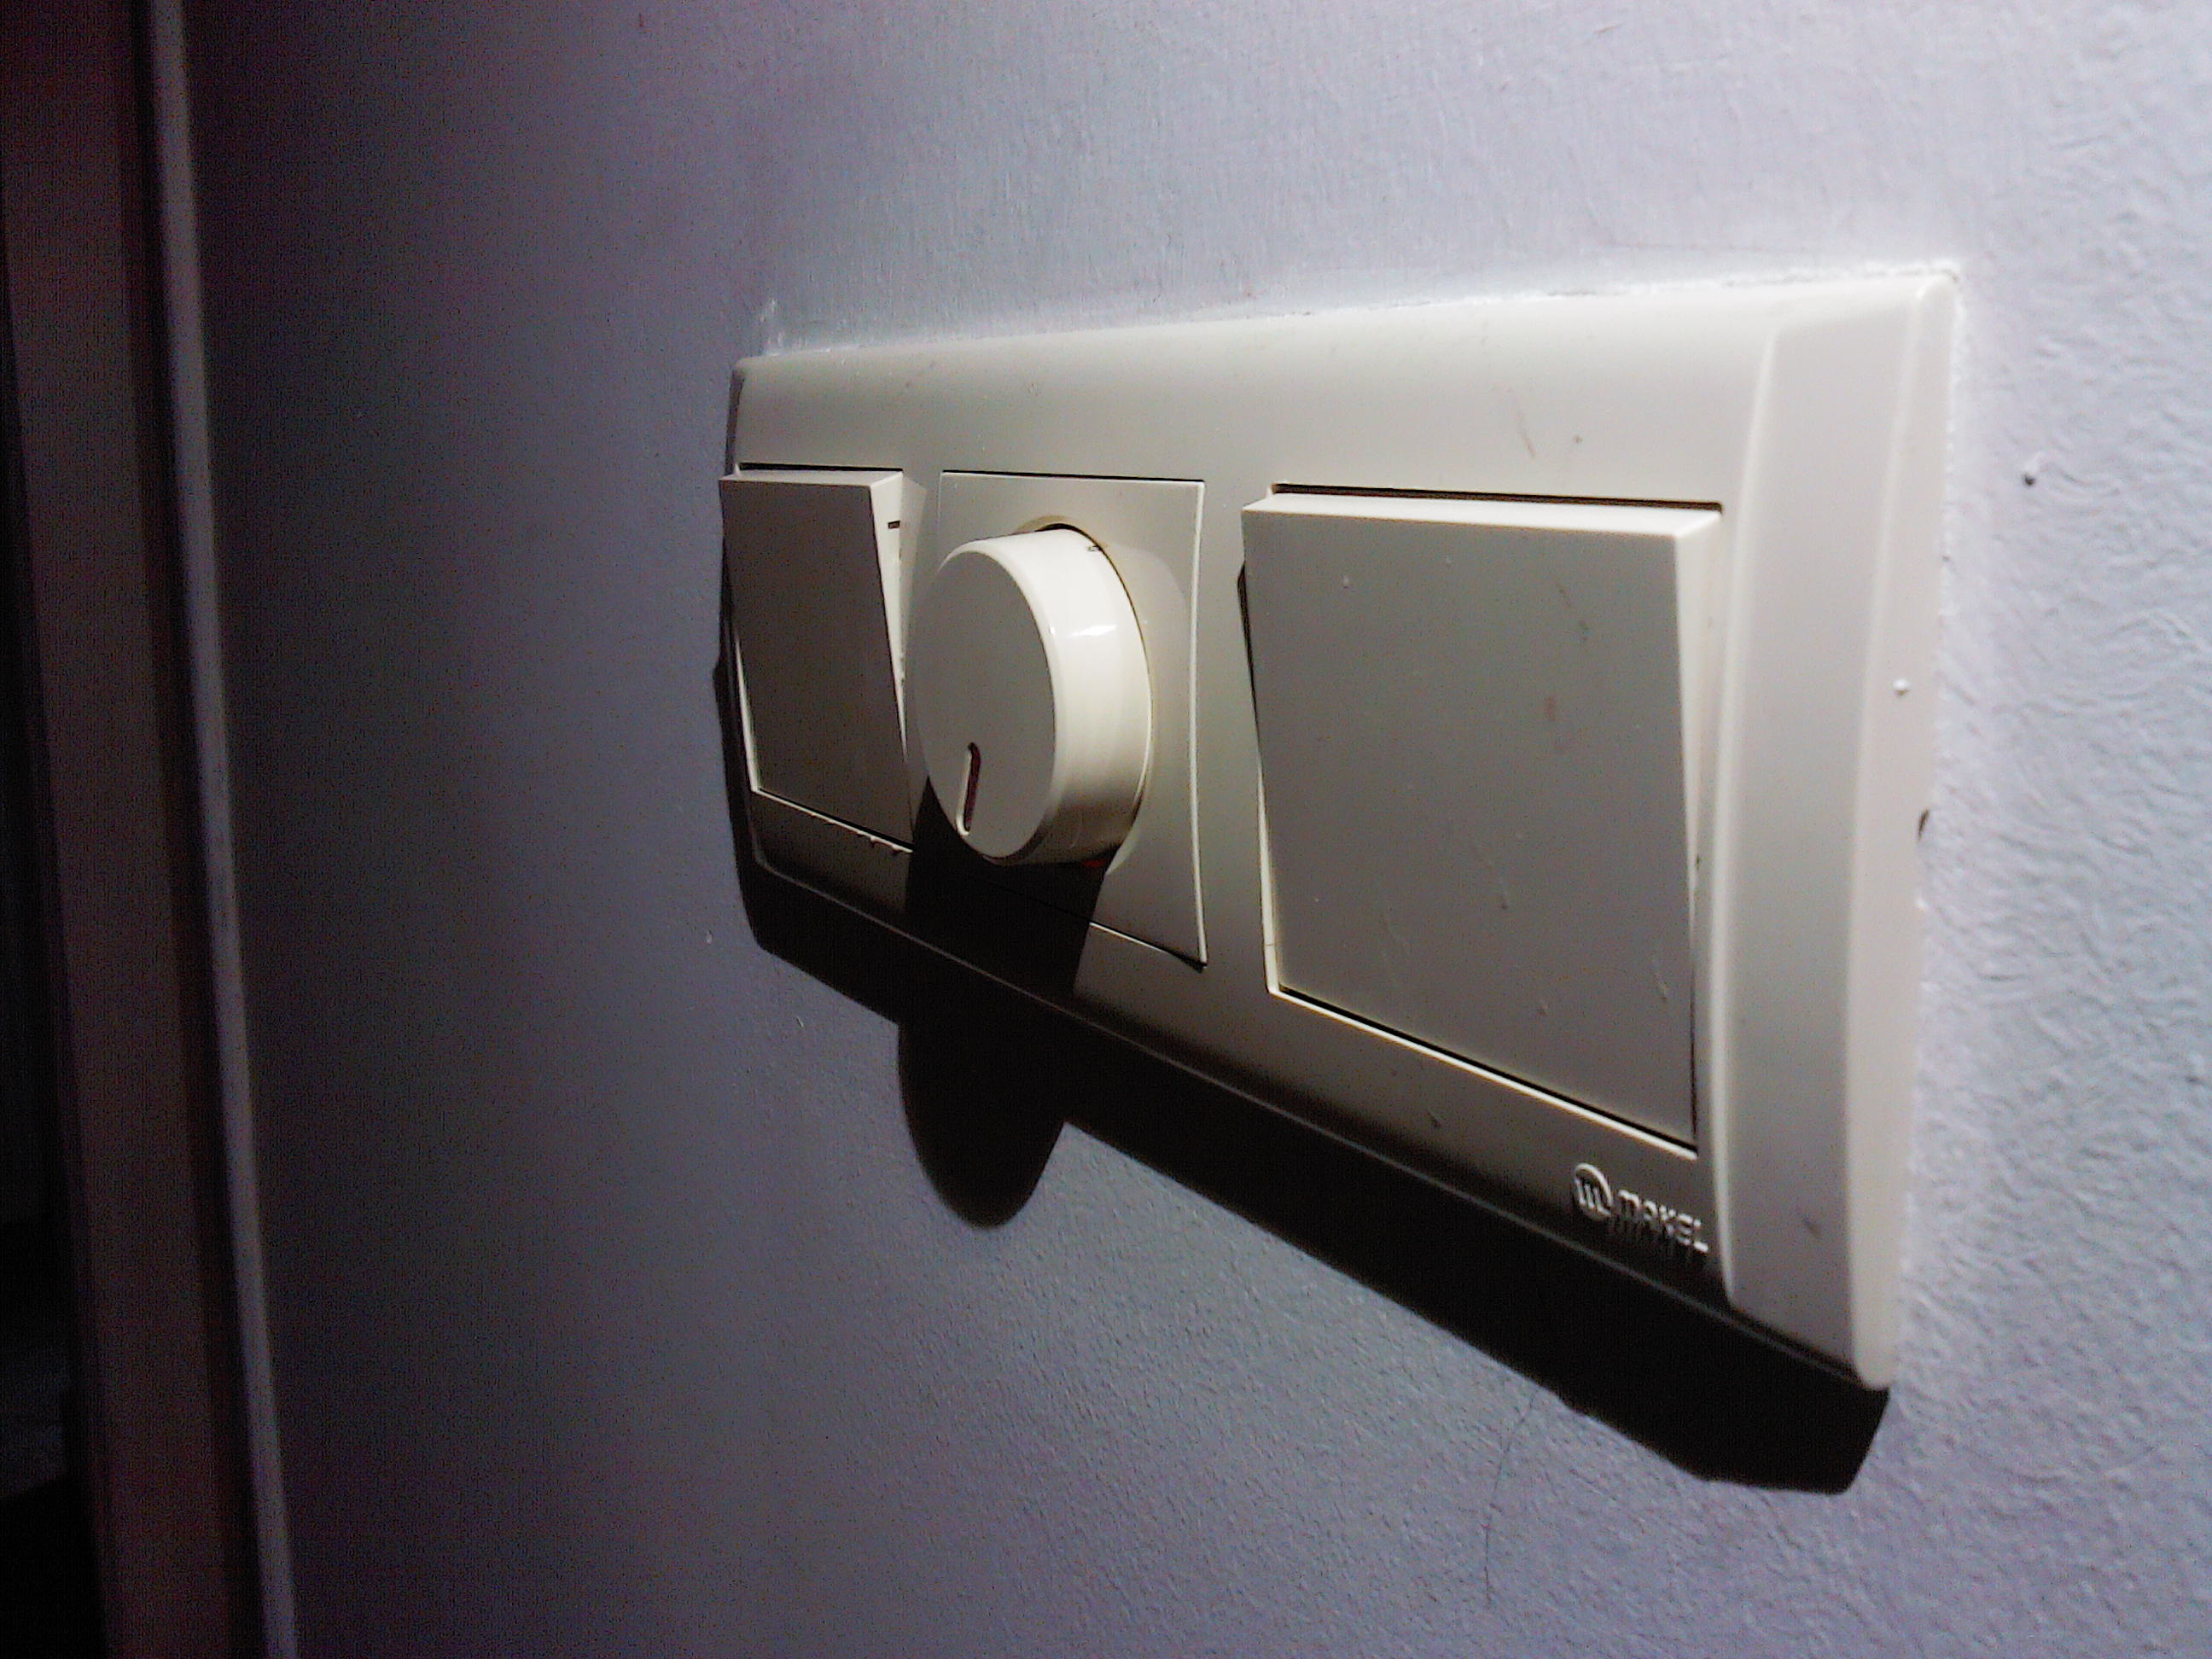 Фото Услуги электрика: замена и установка выключателей 4